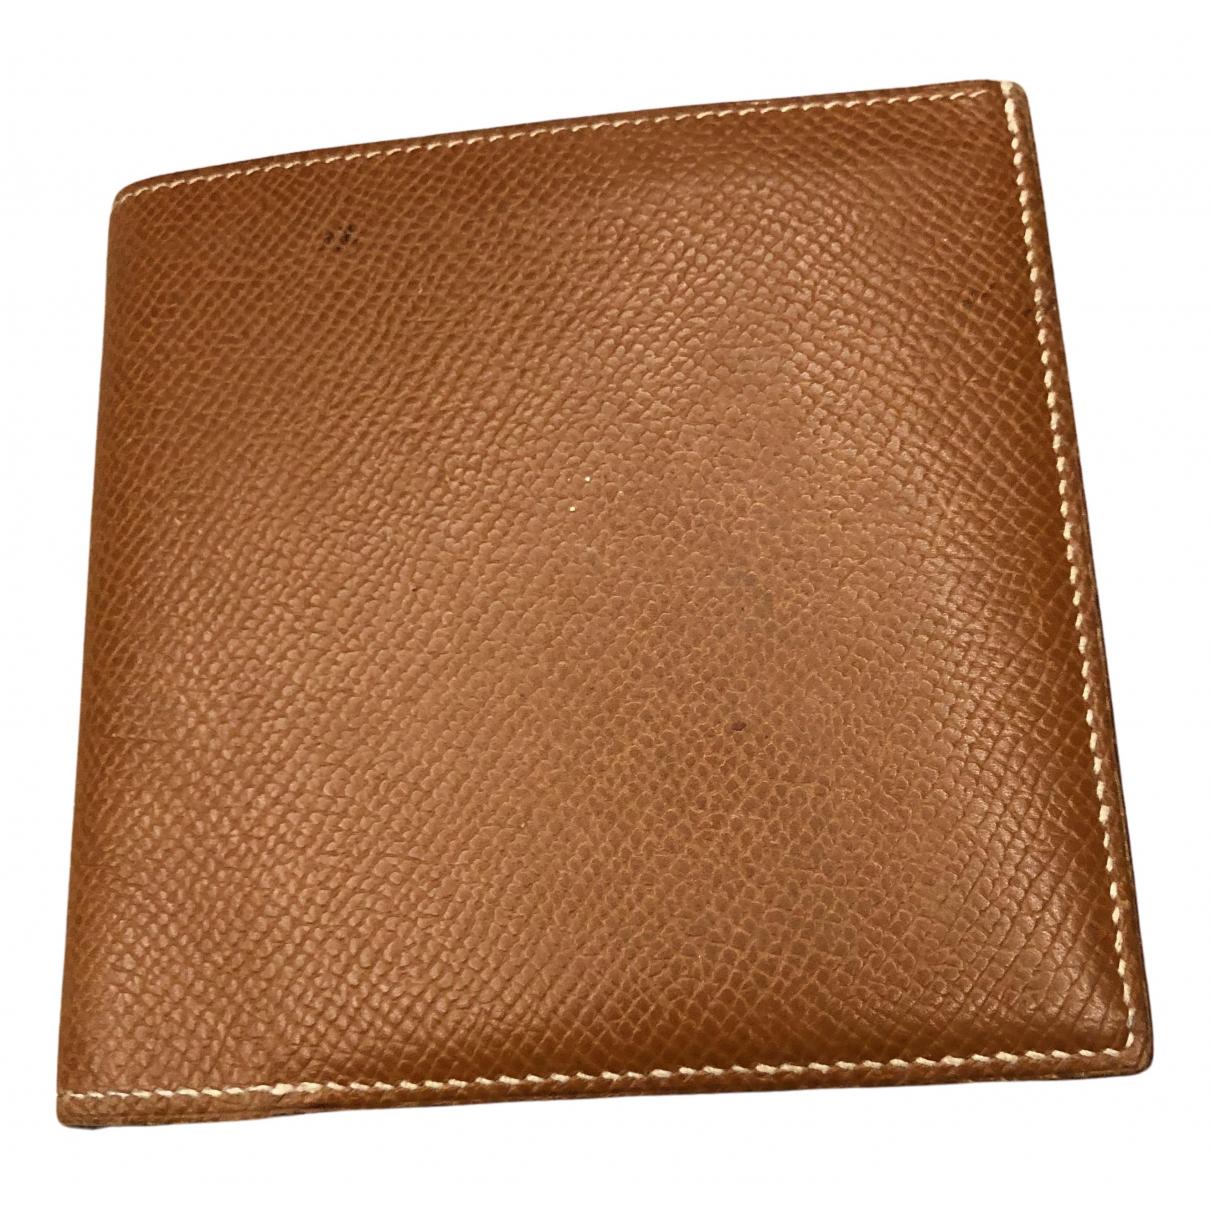 Hermes \N Portemonnaie in  Kamel Leder